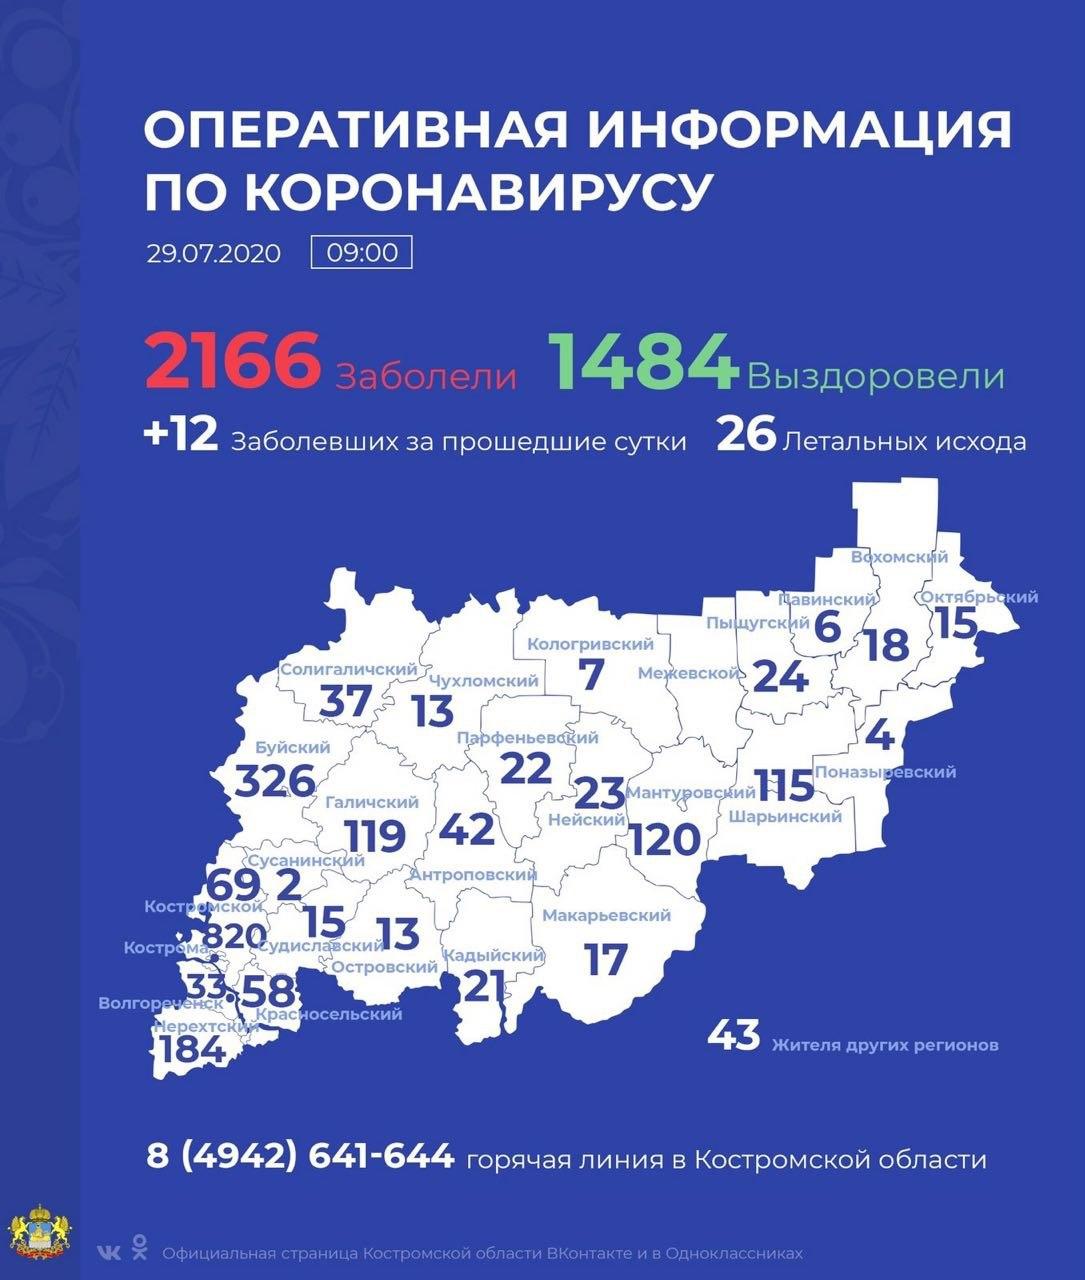 За сутки в регионе 12 новых случаев COVID-19